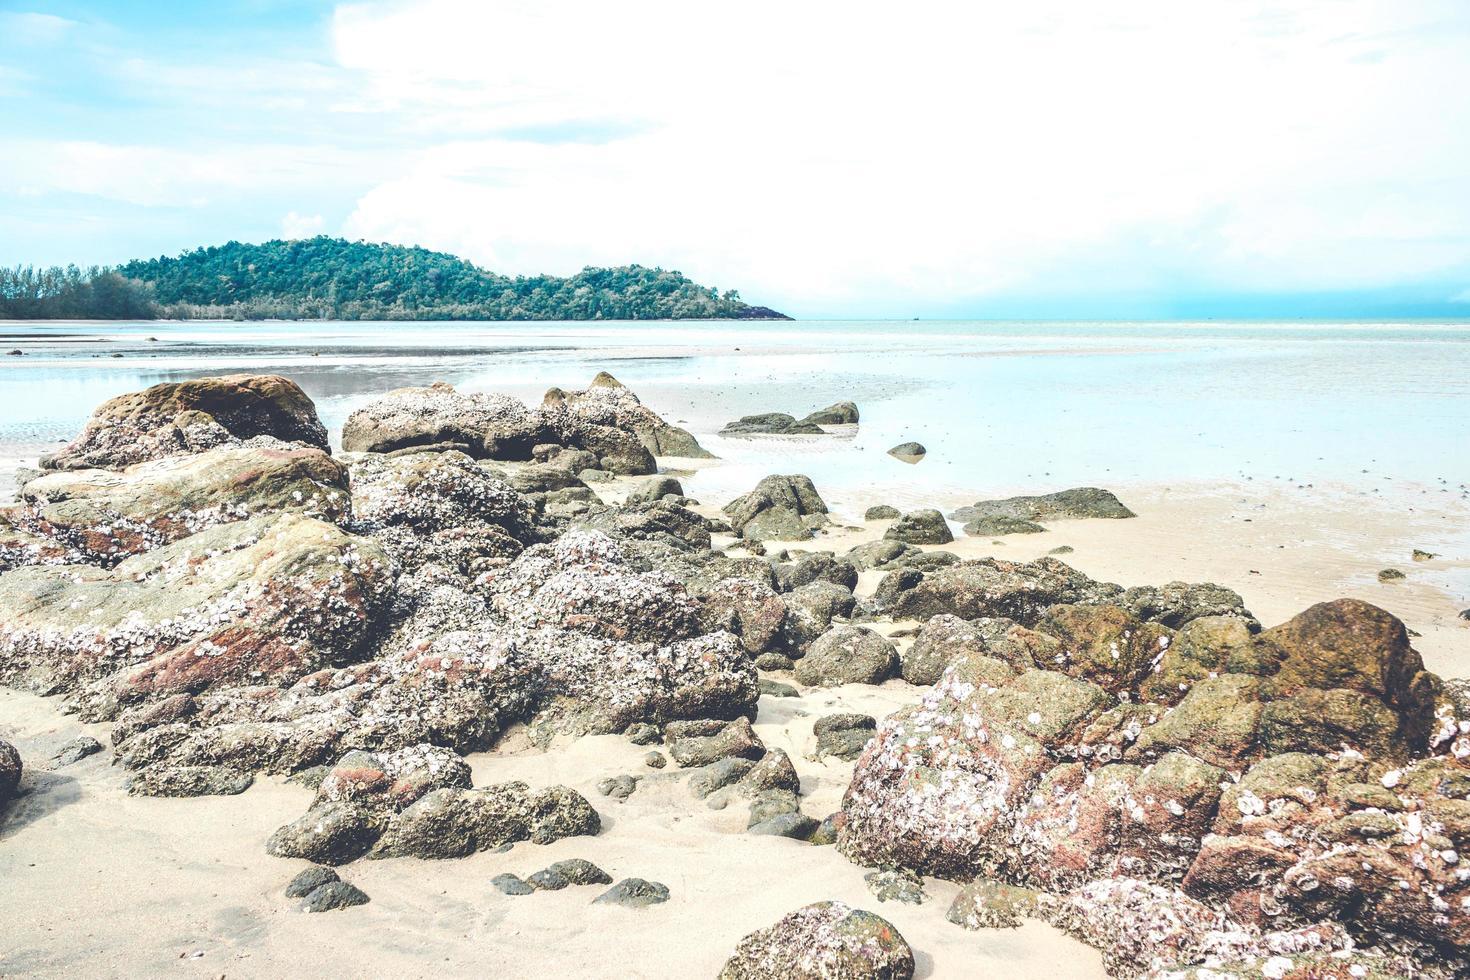 Rocks on beach with cloudy blue sky photo